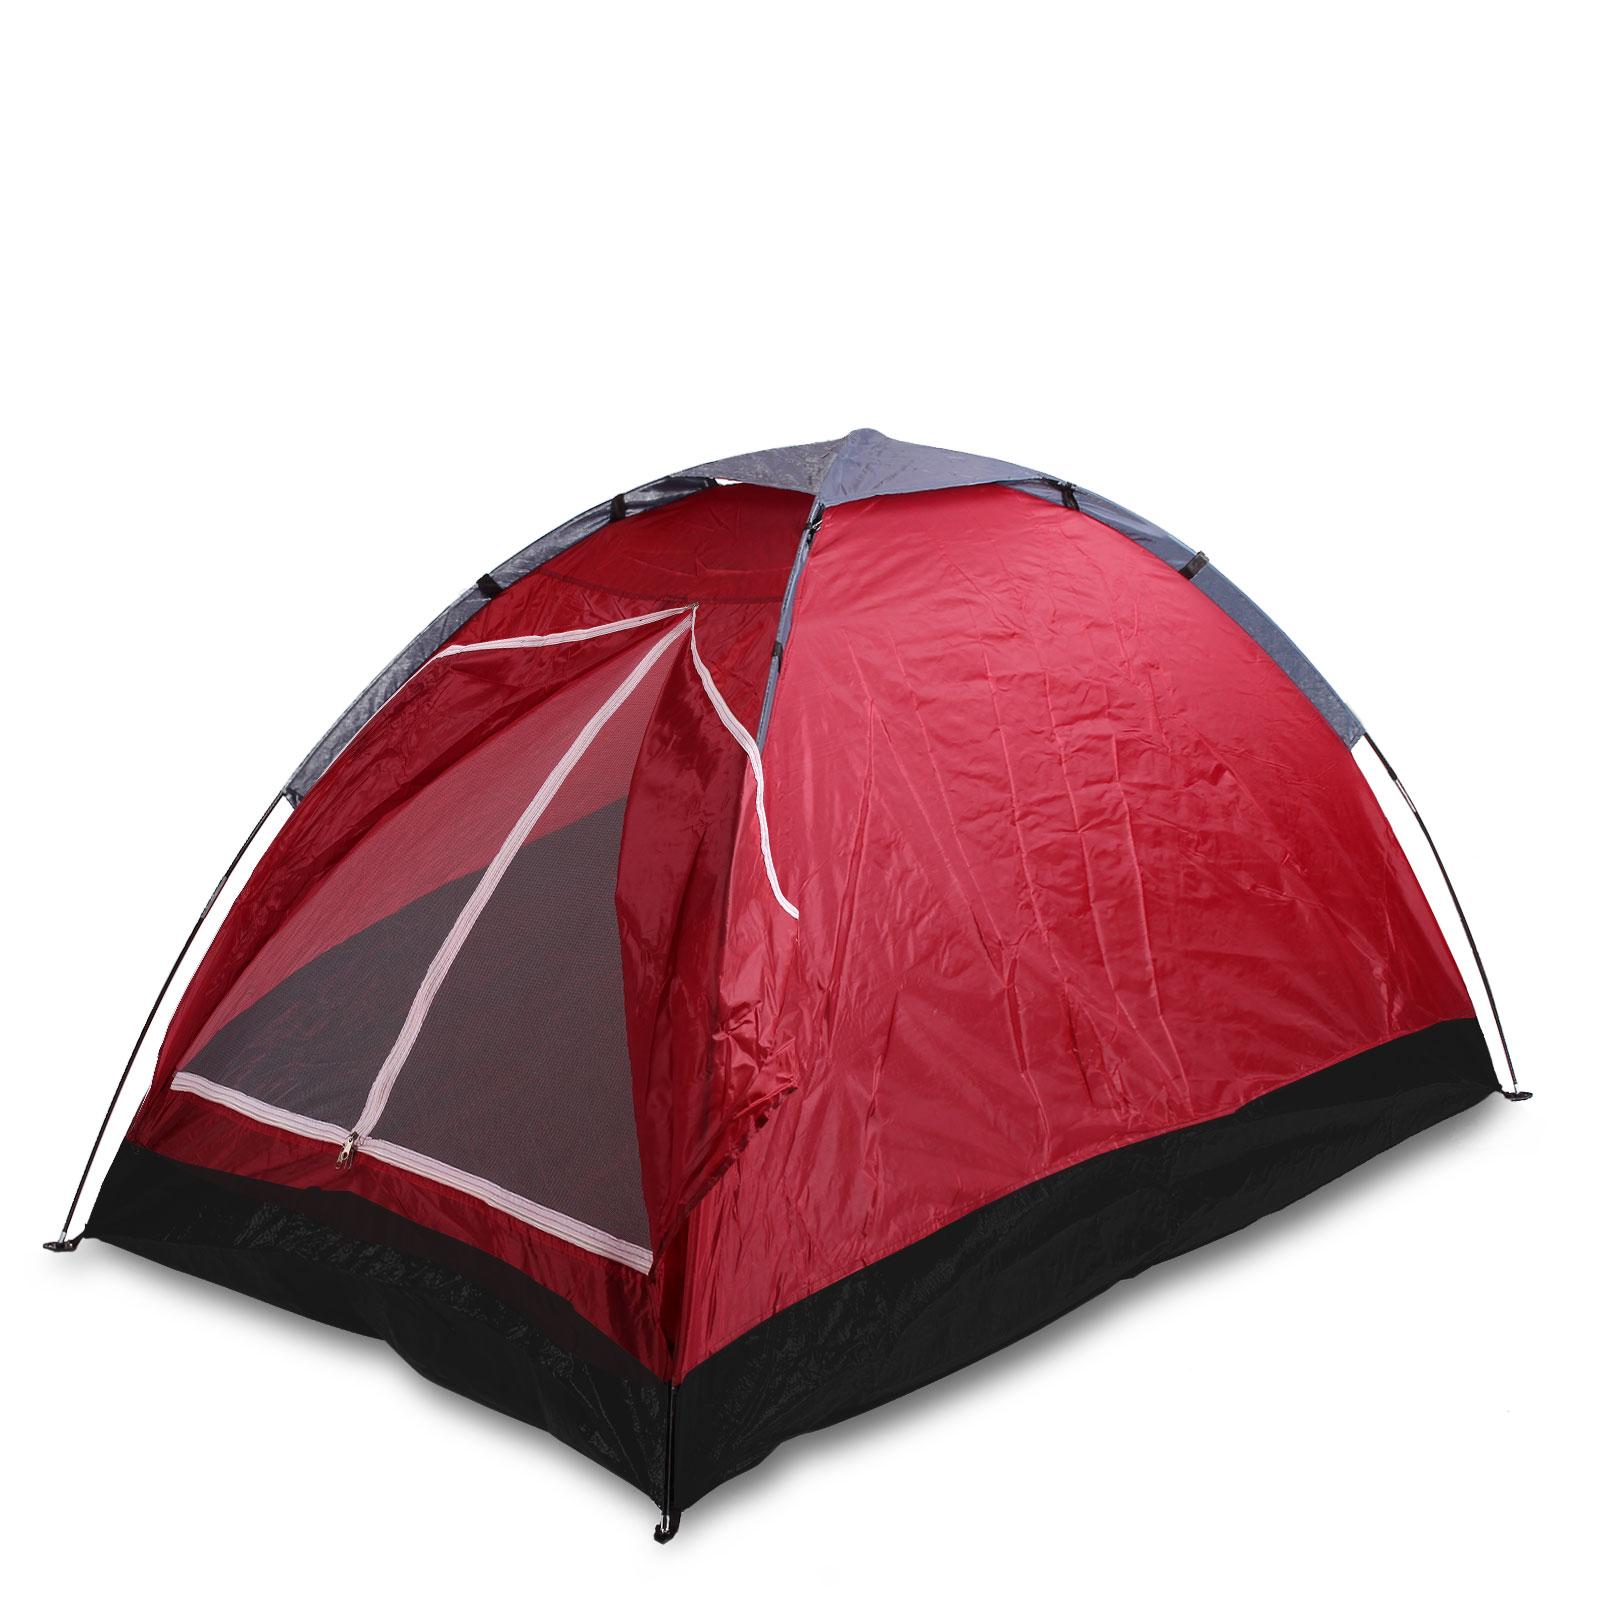 kuppelzelt f r 2 personen rot inkl 2x schlafsack isomatte. Black Bedroom Furniture Sets. Home Design Ideas